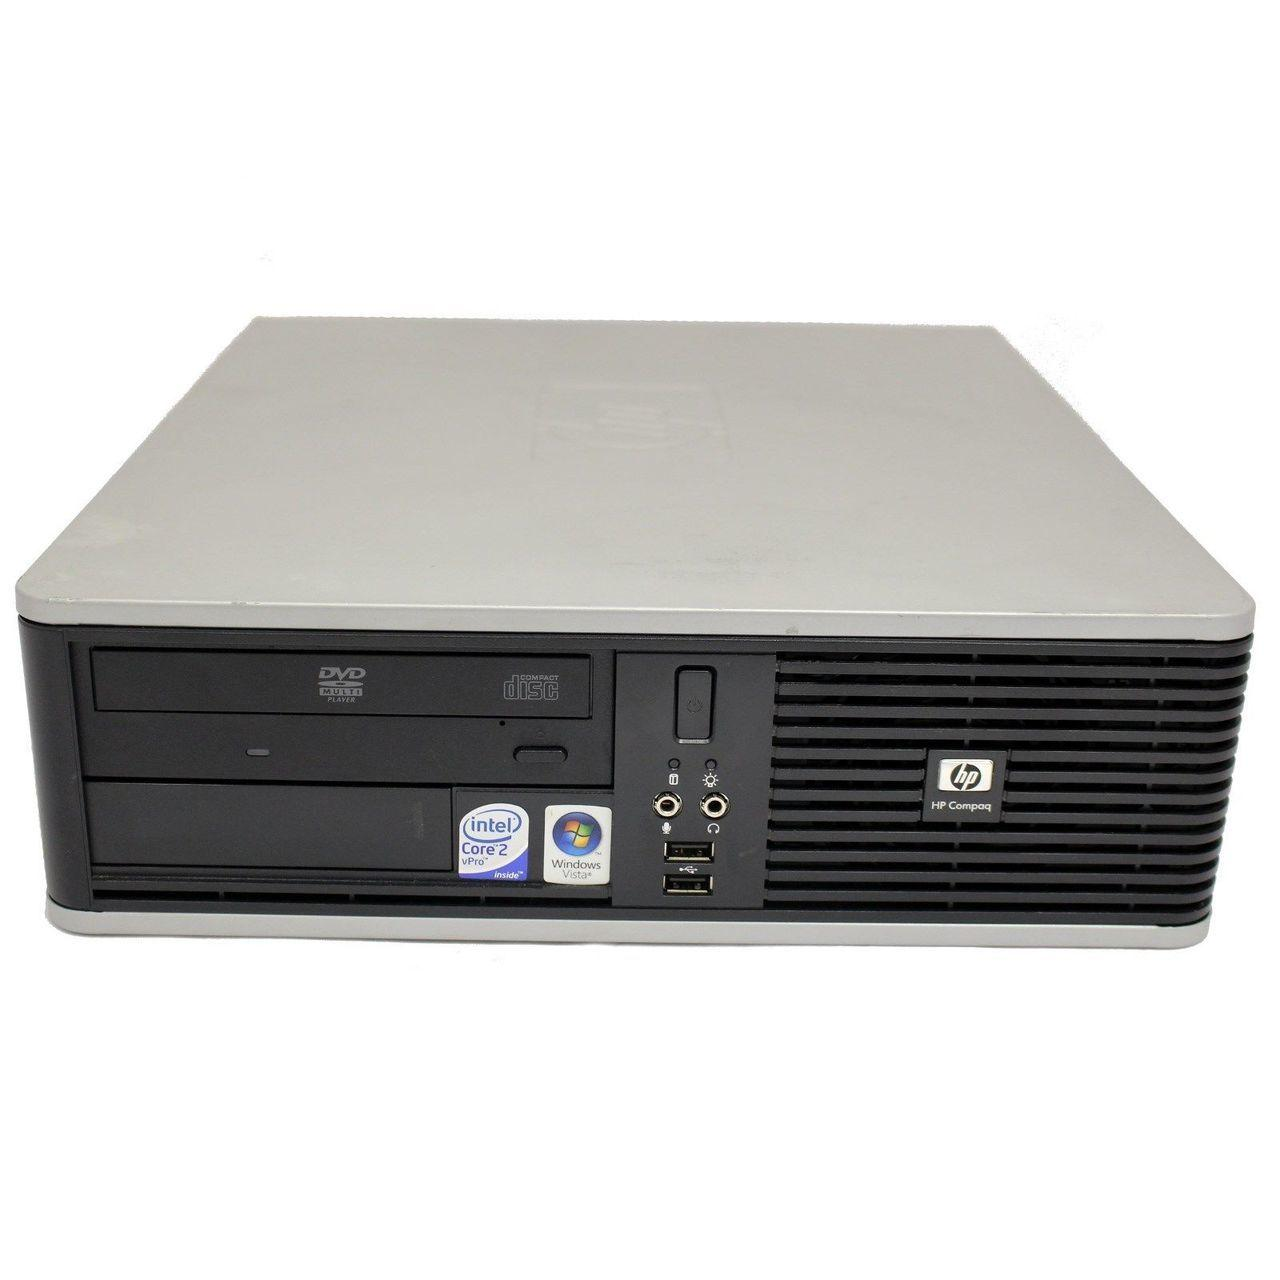 Системный блок, компьютер, AMD Athlon 64 X2 4200, 2 ядра по 2,2 Ггц, 8 Гб ОЗУ, HDD 500 Гб